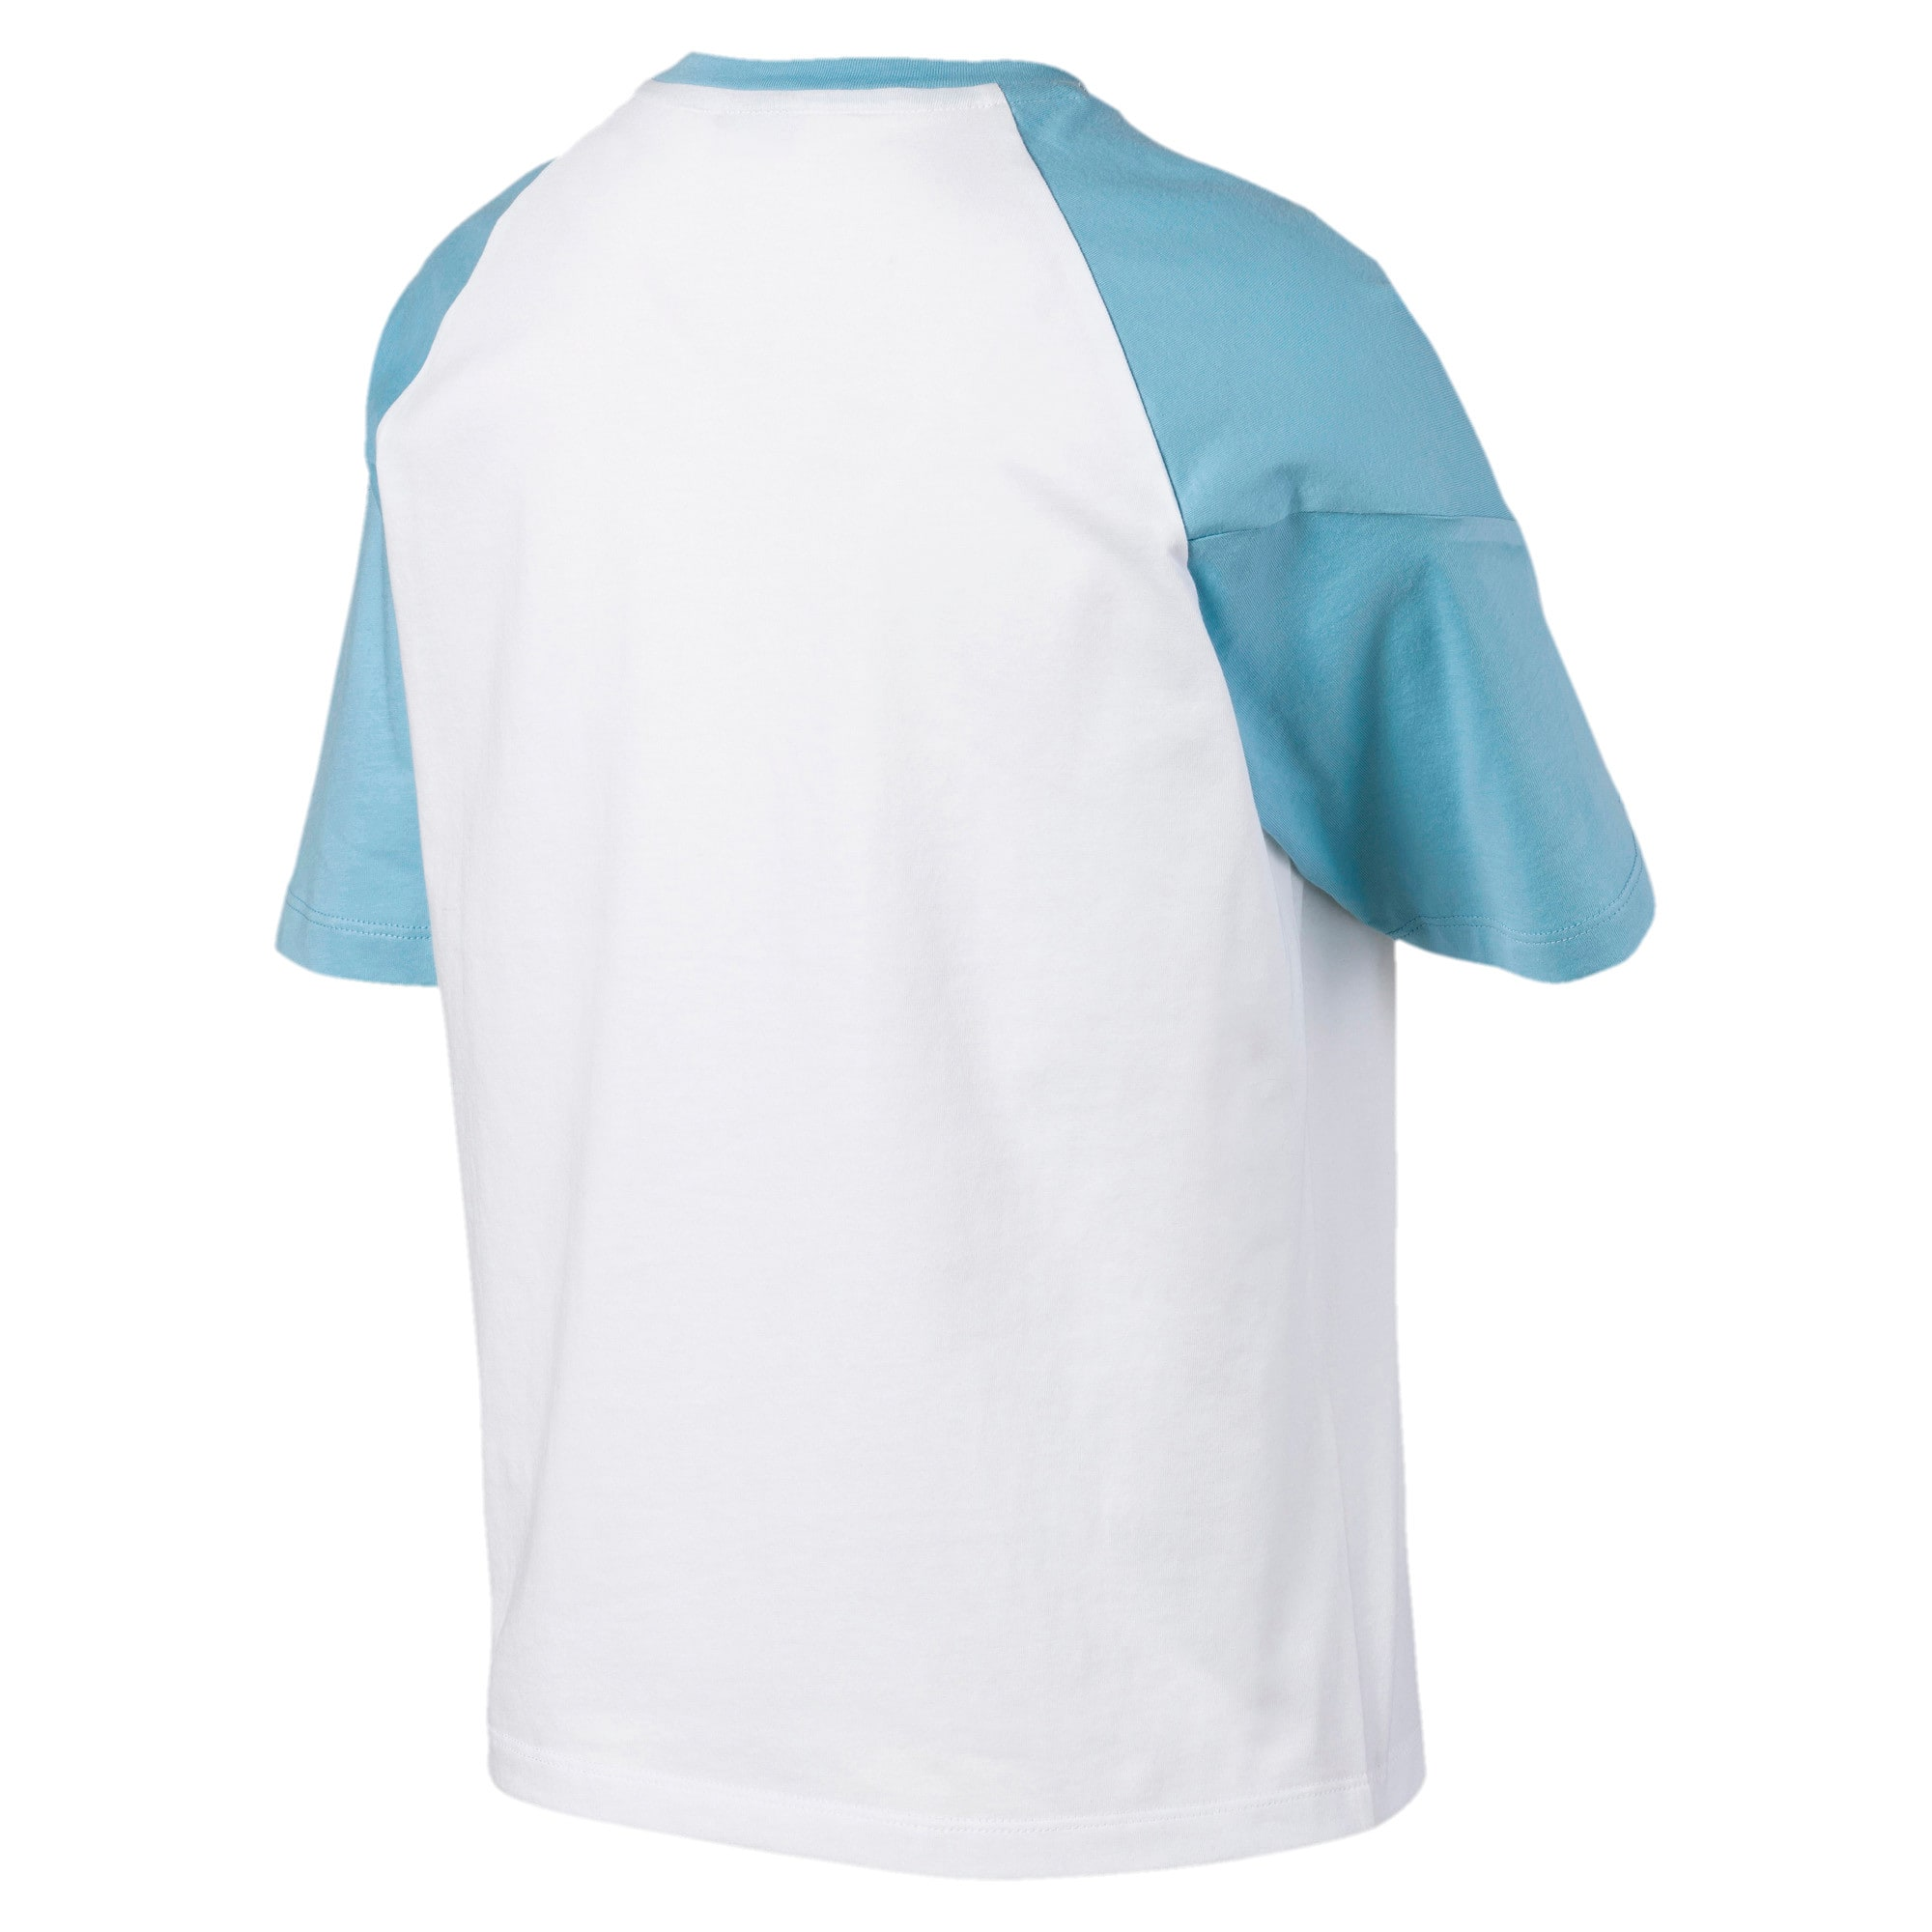 Thumbnail 5 of プーマ XTG ウィメンズ CB SS Tシャツ 半袖, Puma White, medium-JPN